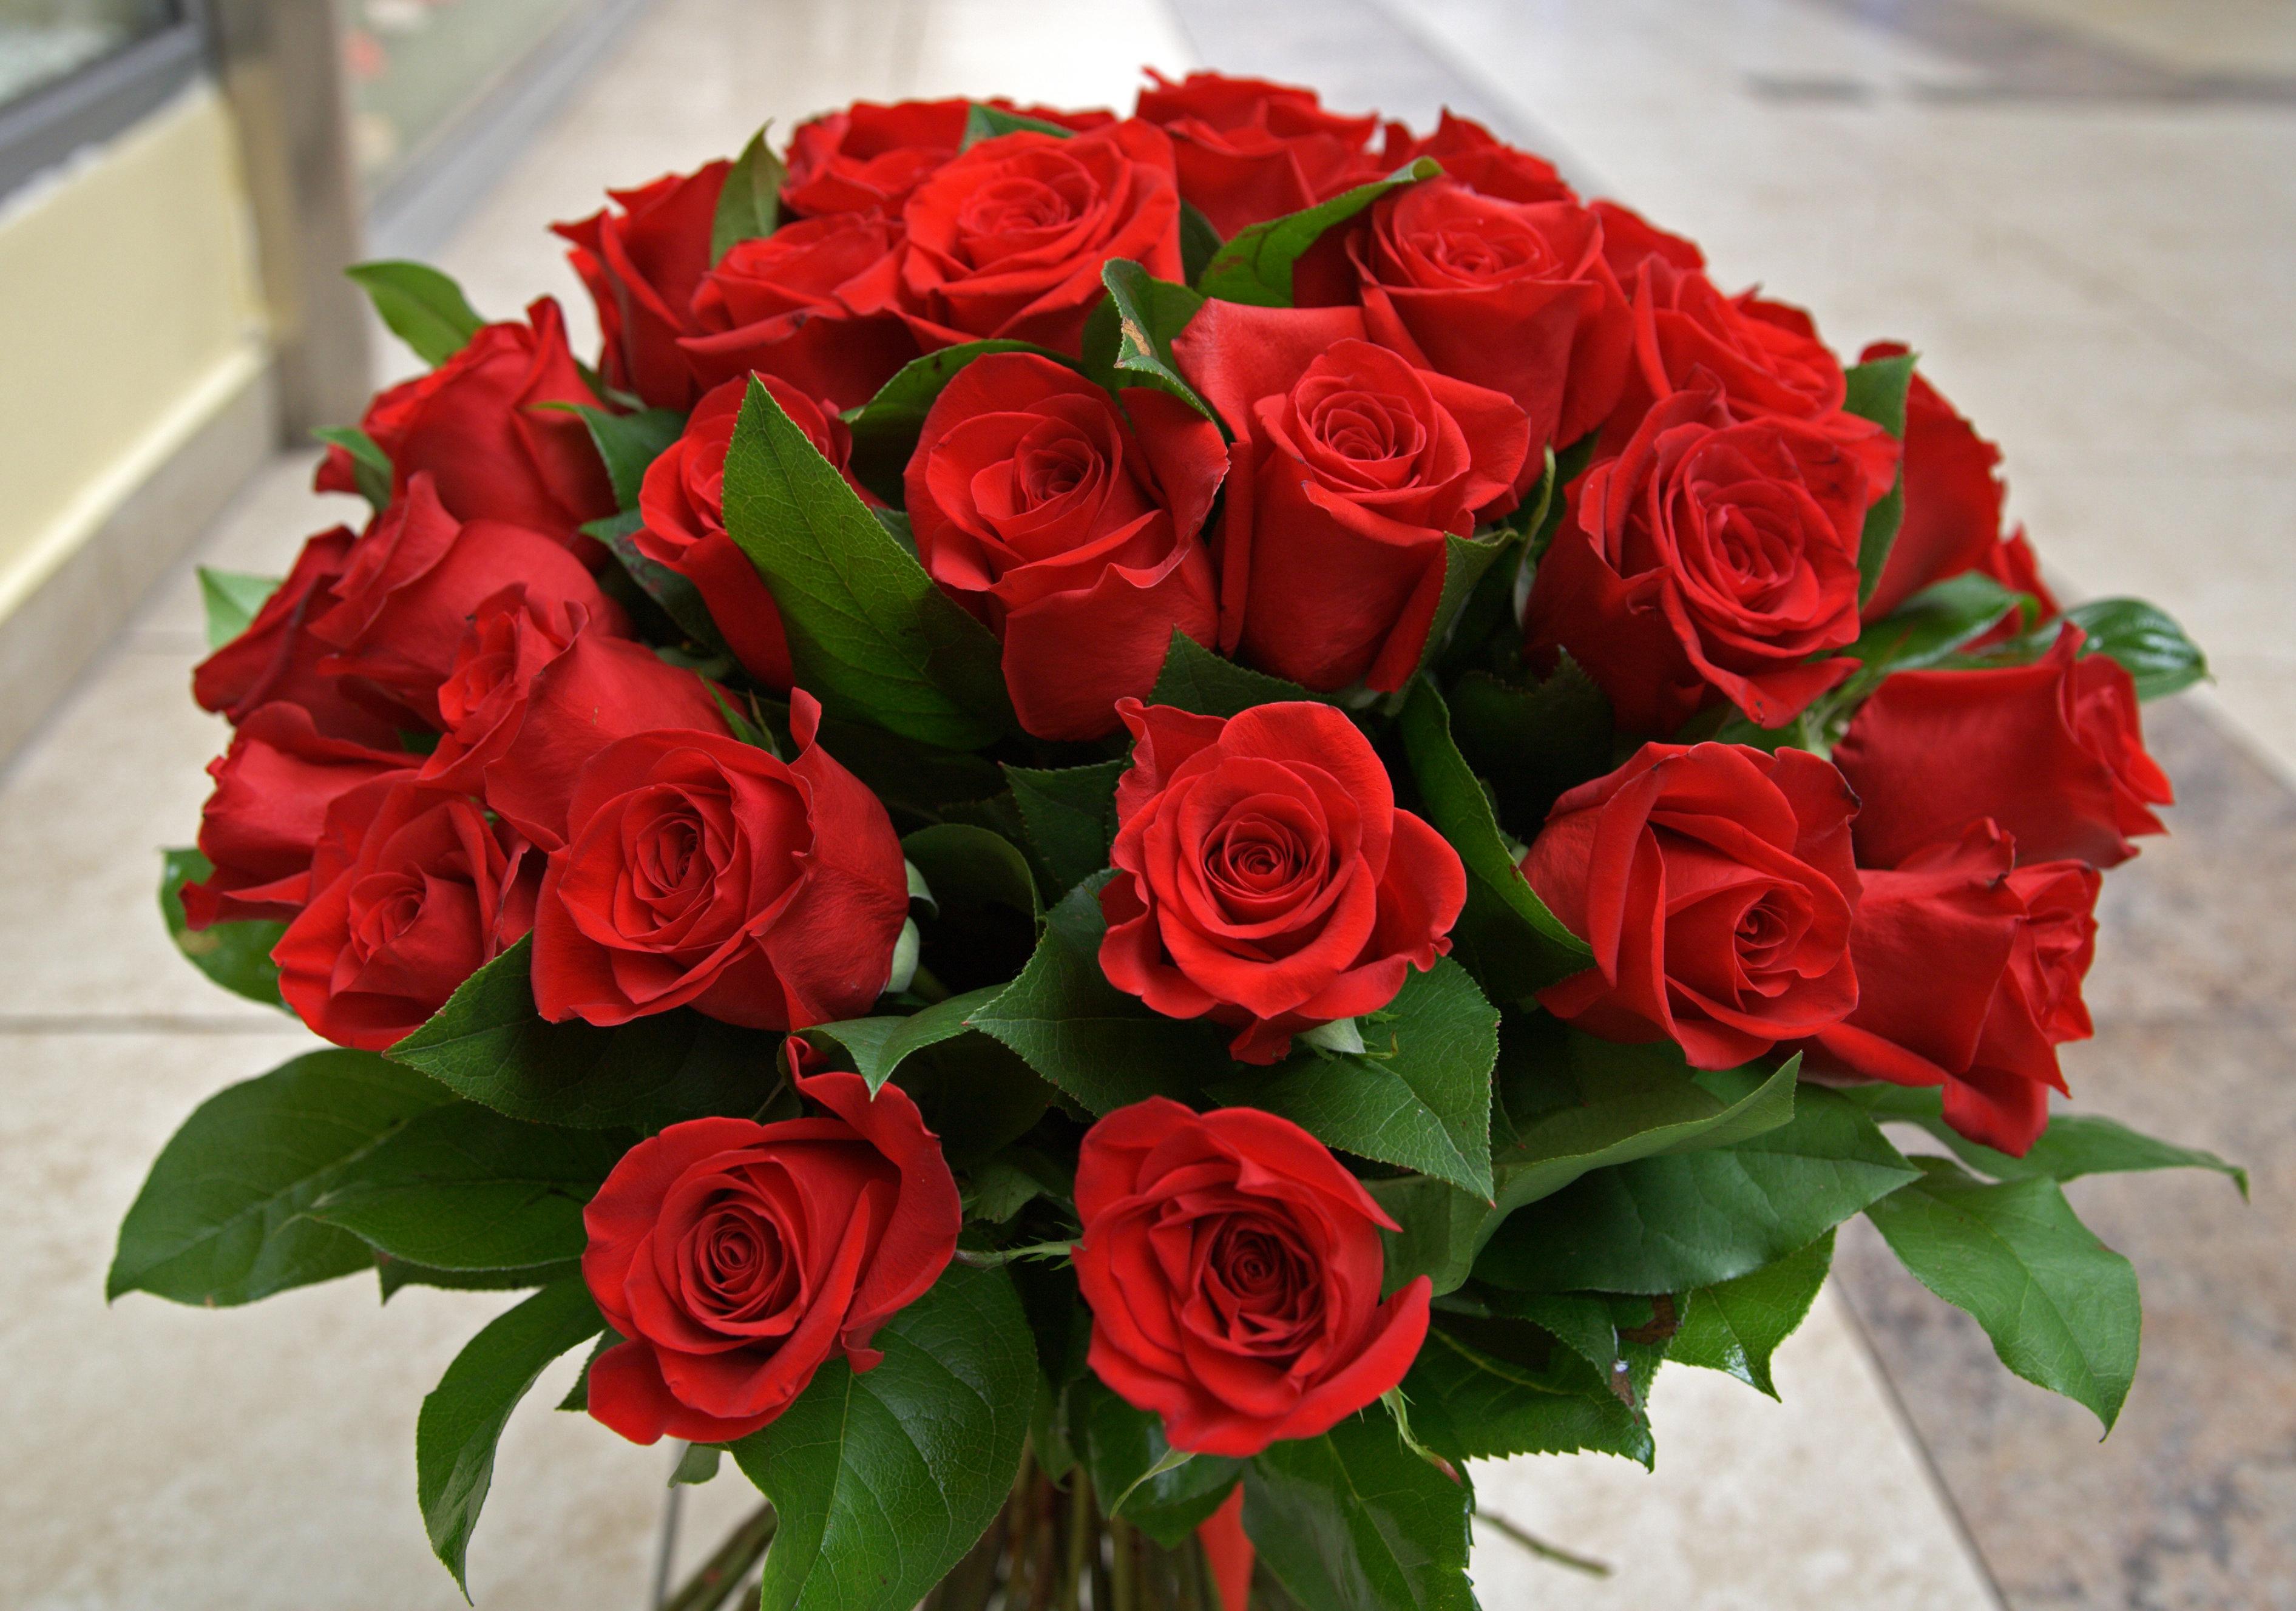 buchet_de_trandafiri_rosii